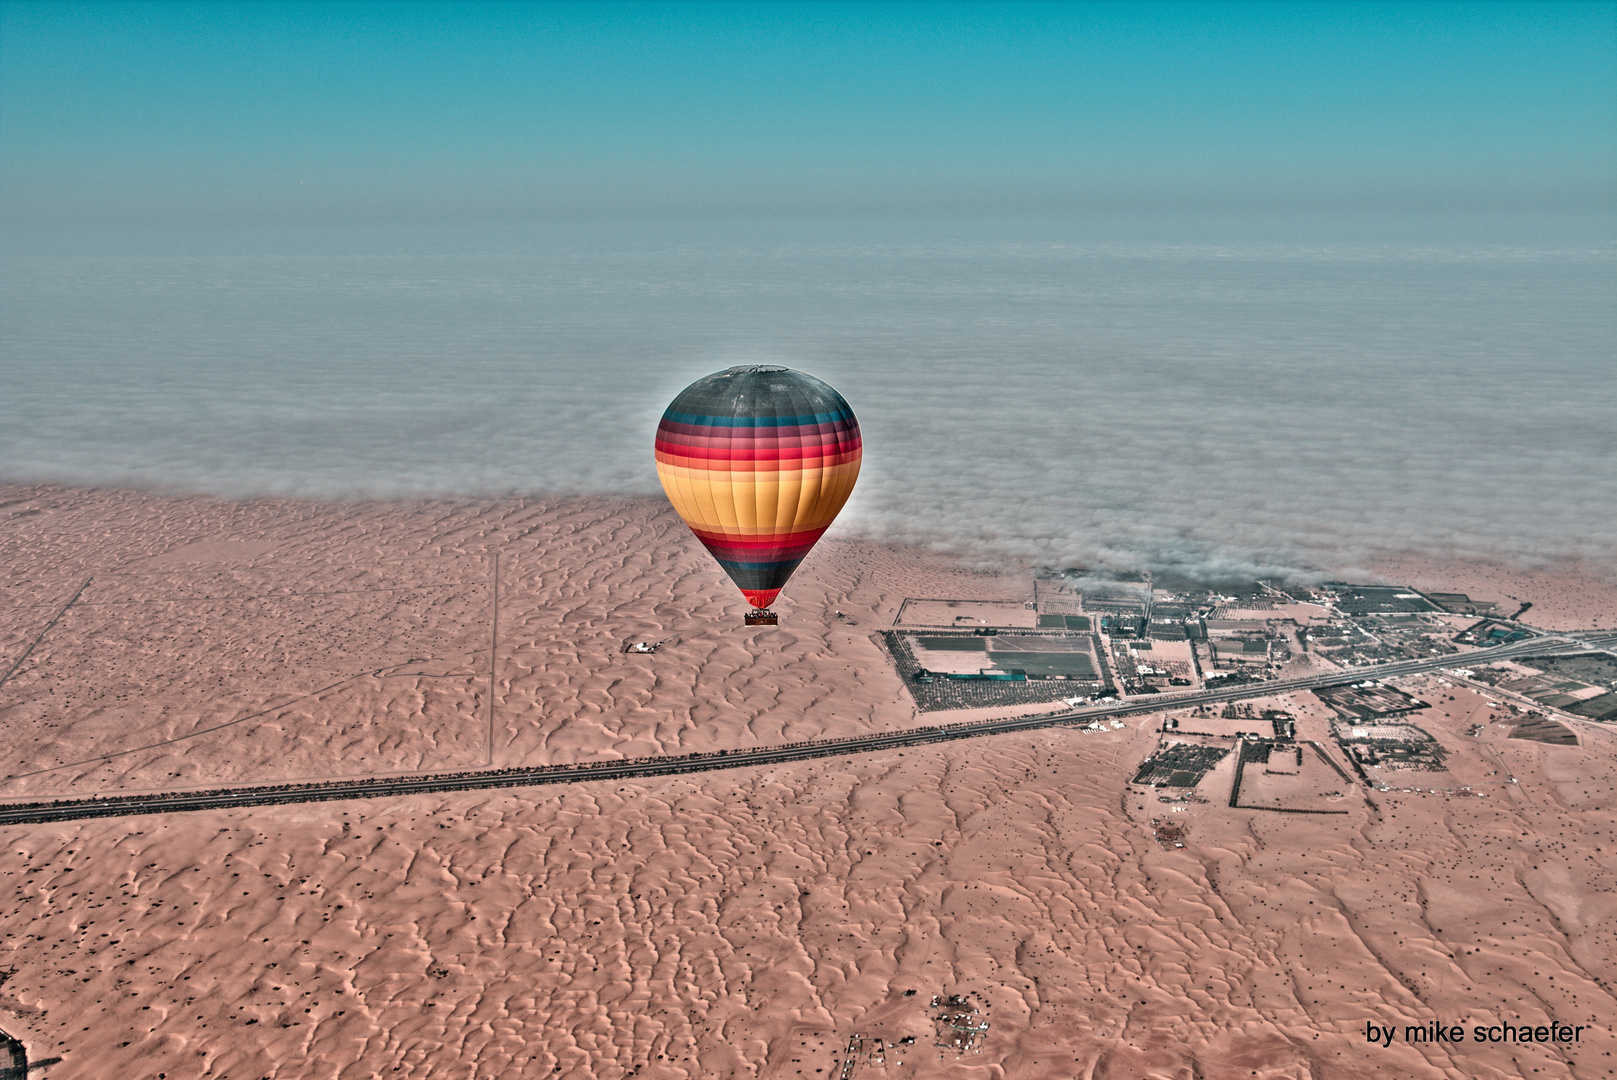 DesertBallooning Dubai